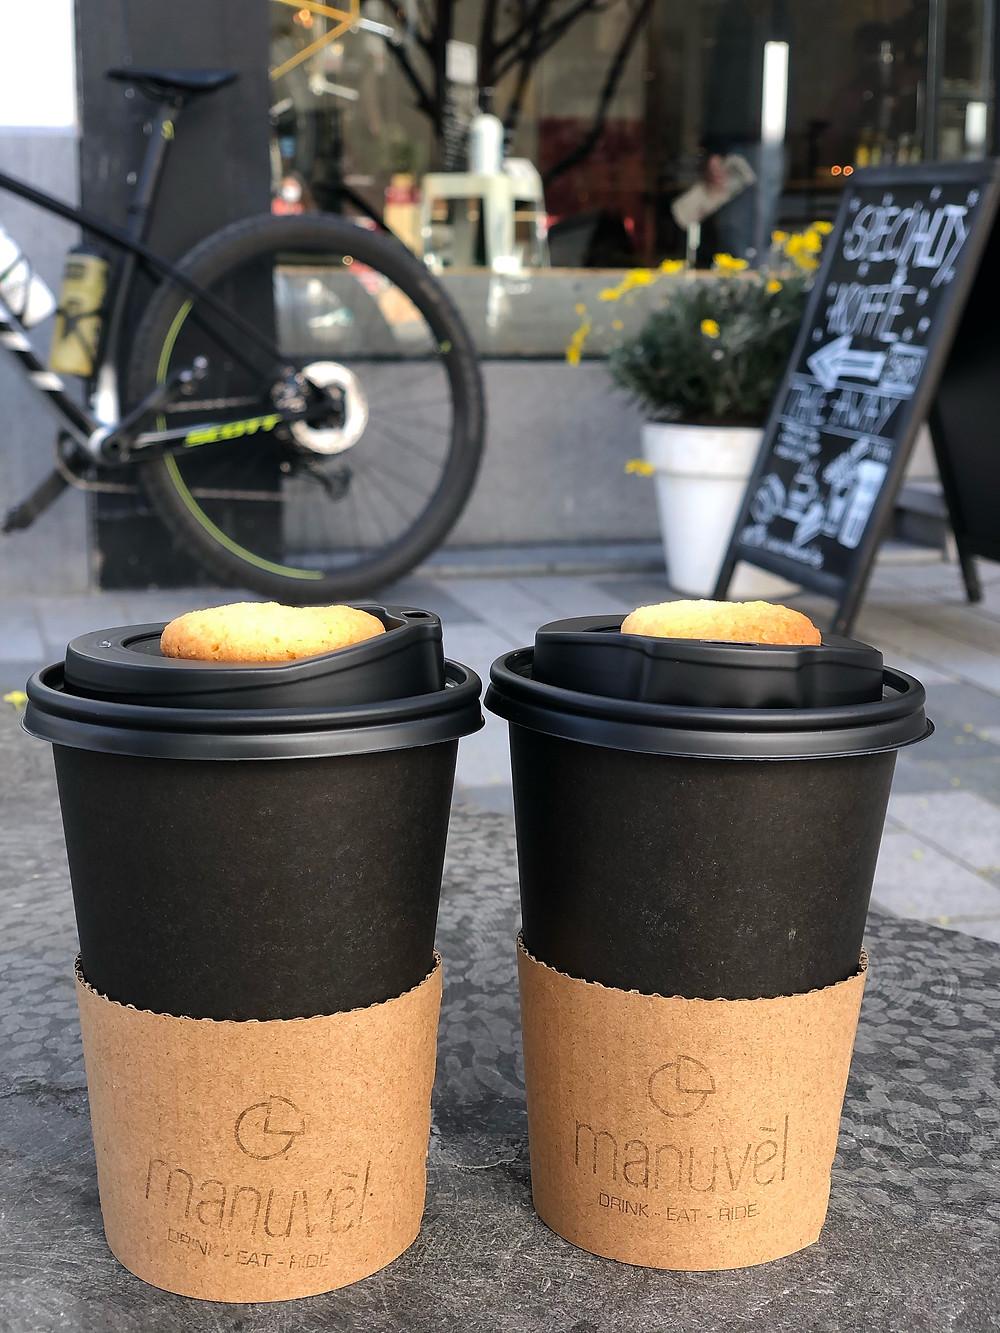 Coffee at Manuvèl Sint-Niklaas